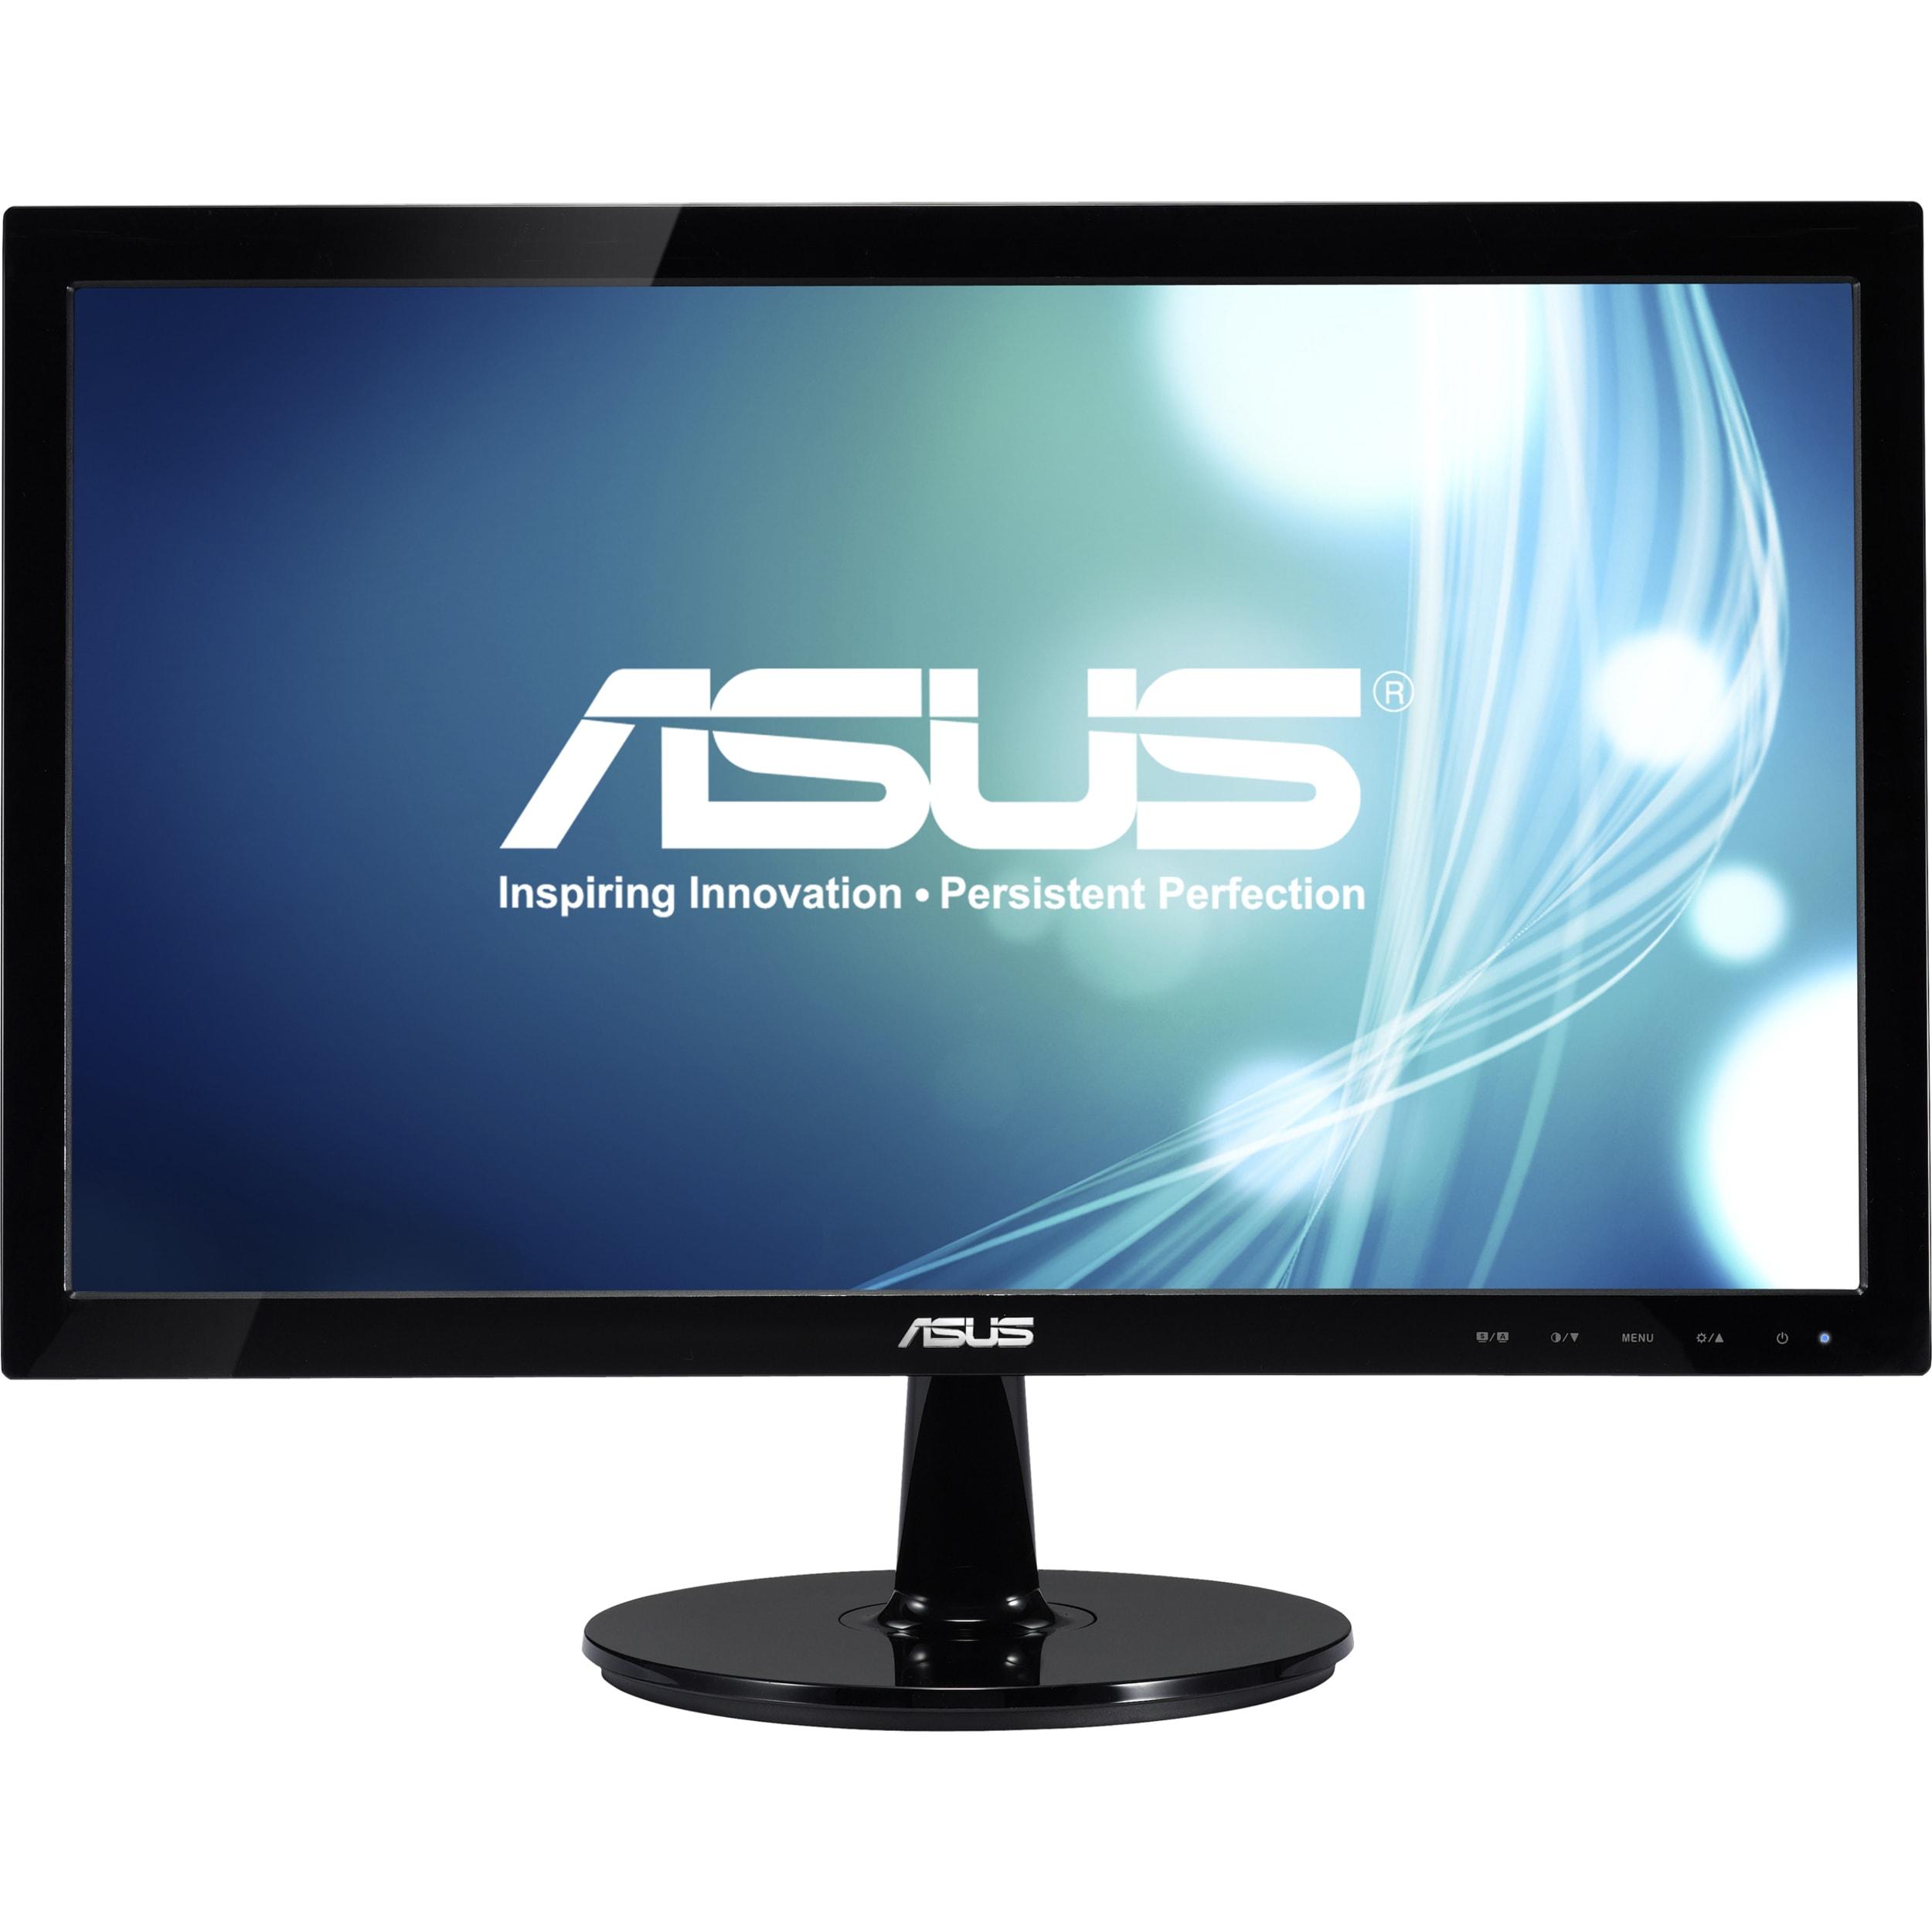 "Asus VS207D-P 19.2"" HD LED LCD Monitor"